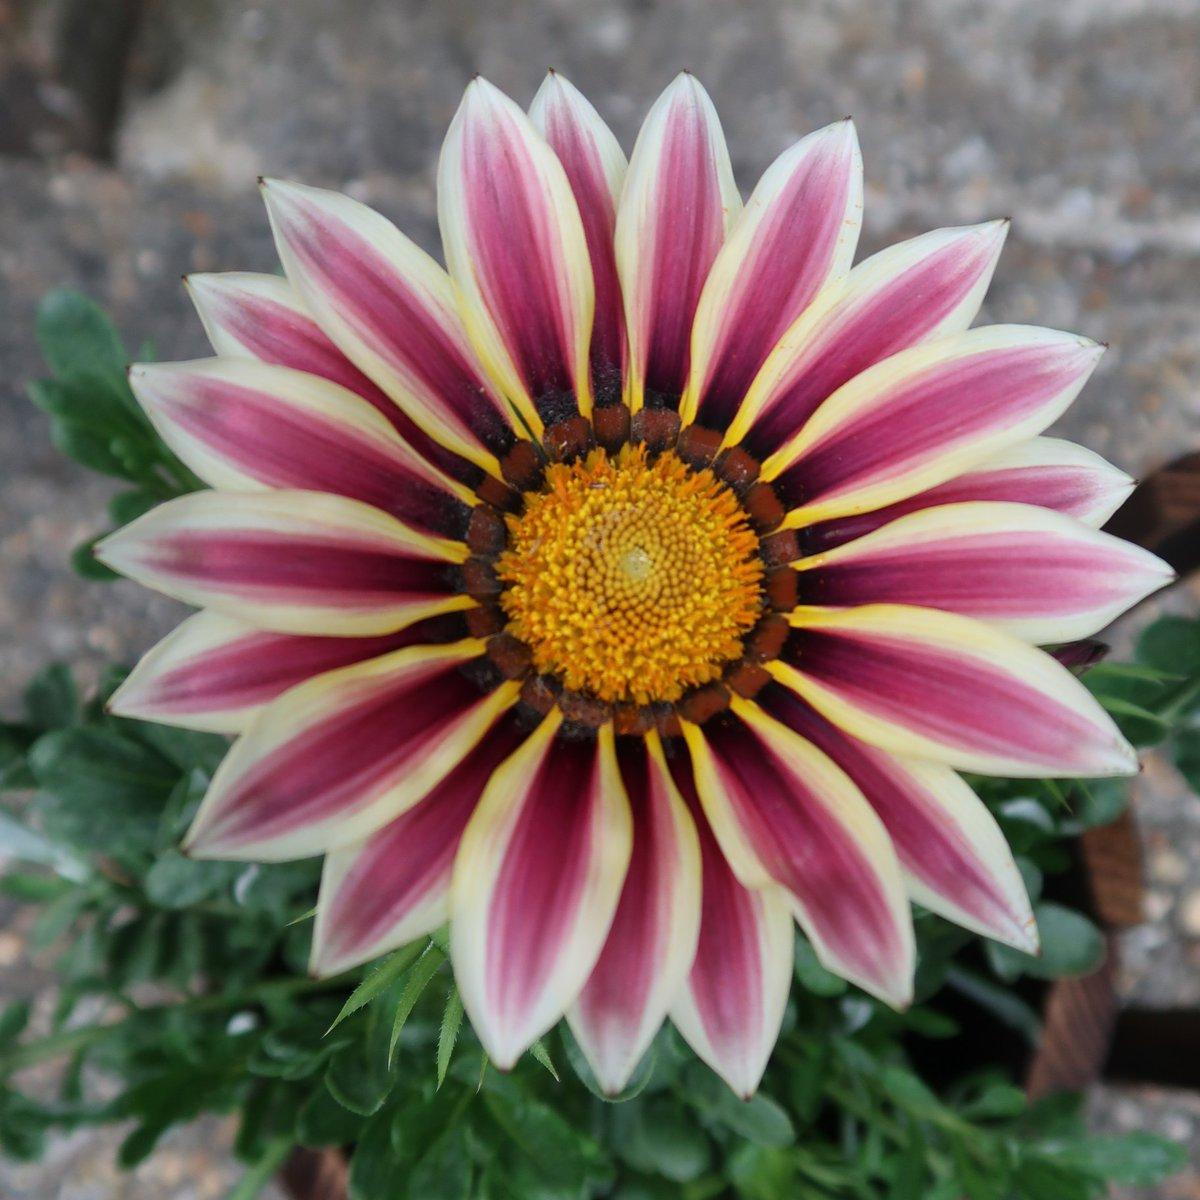 #FlowersOnFriday theme 'a single flower'. #mygarden #flowers #garden #art #photography 🐌🍄💗